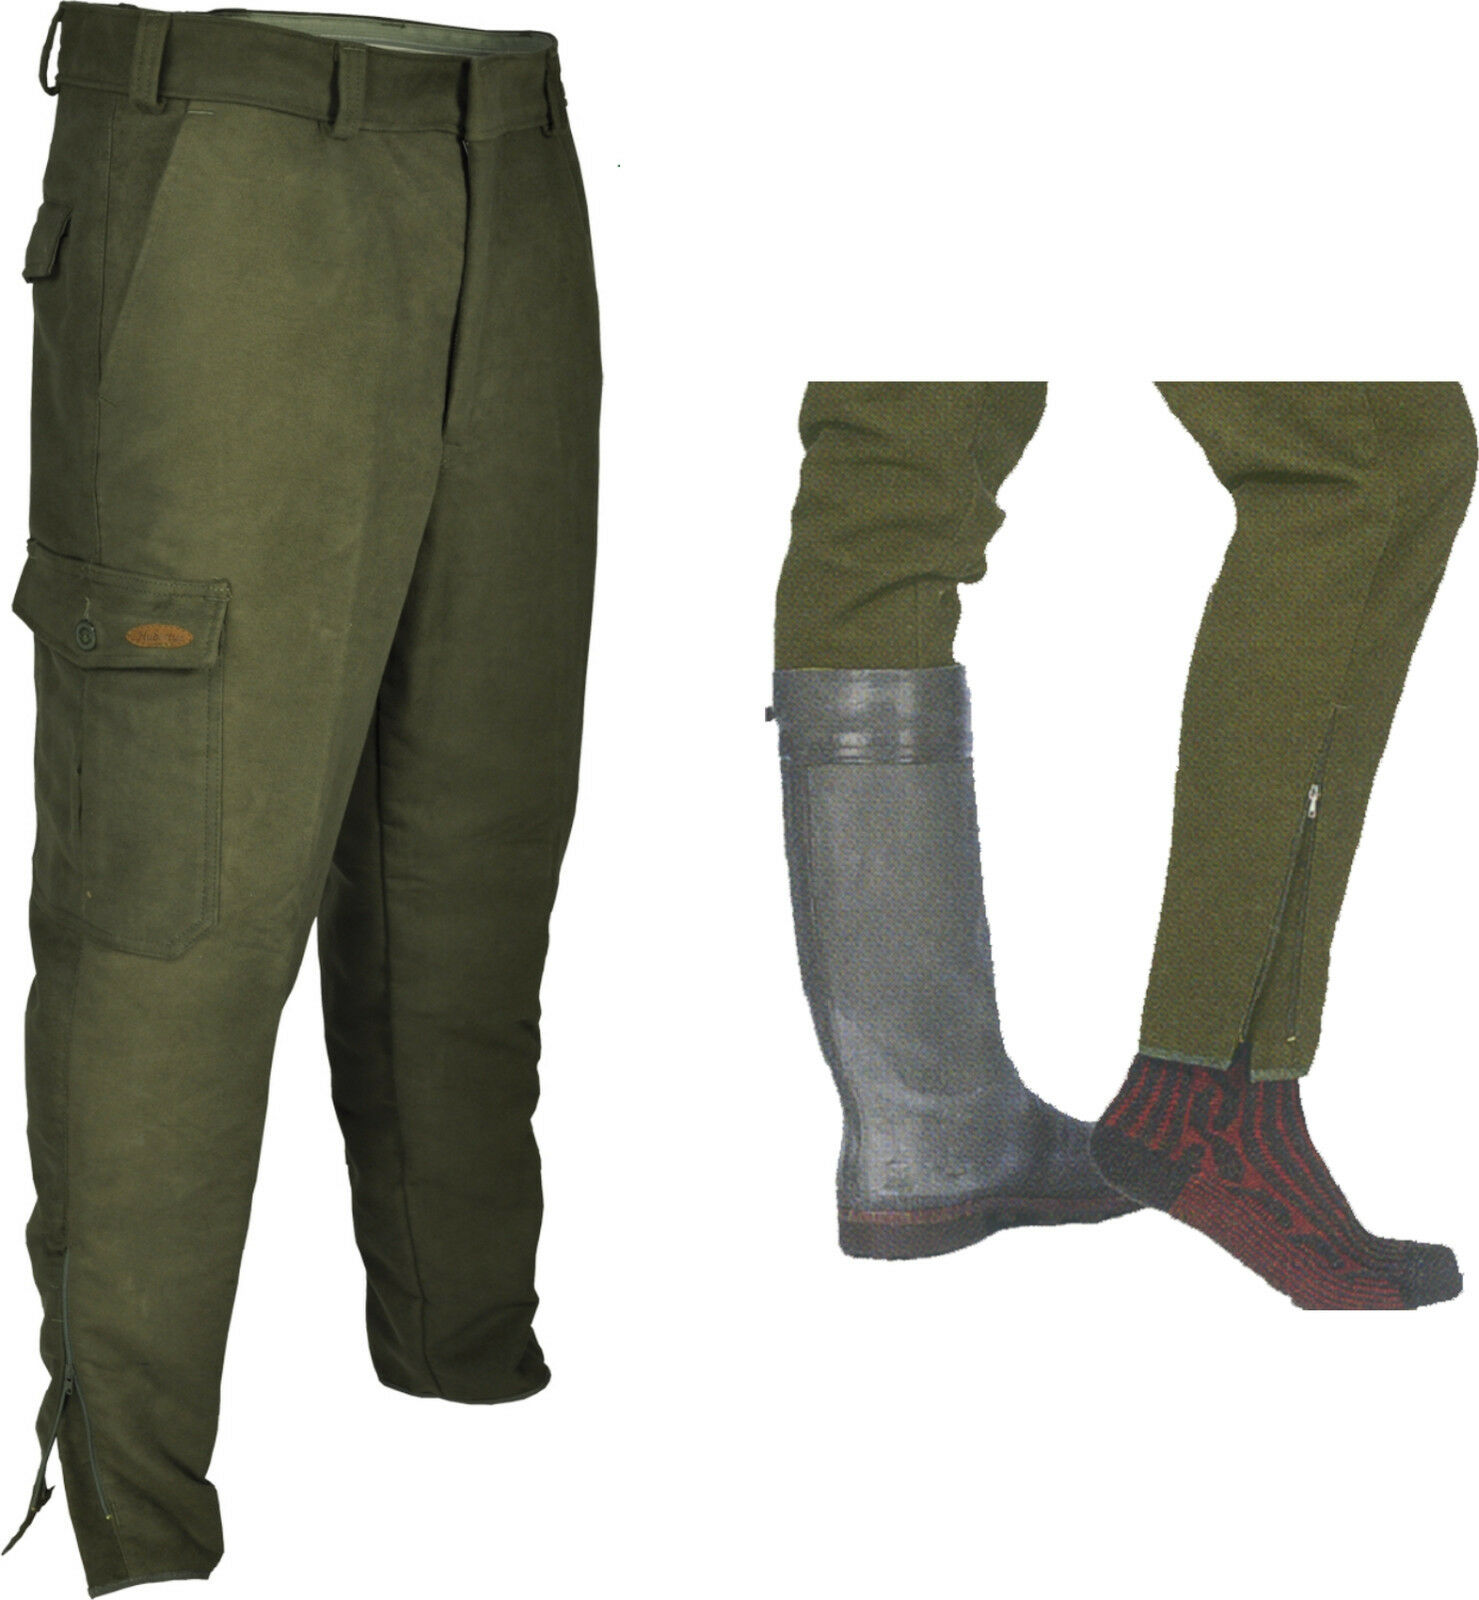 botas pantalones de velveton caza pantalones Hubertus